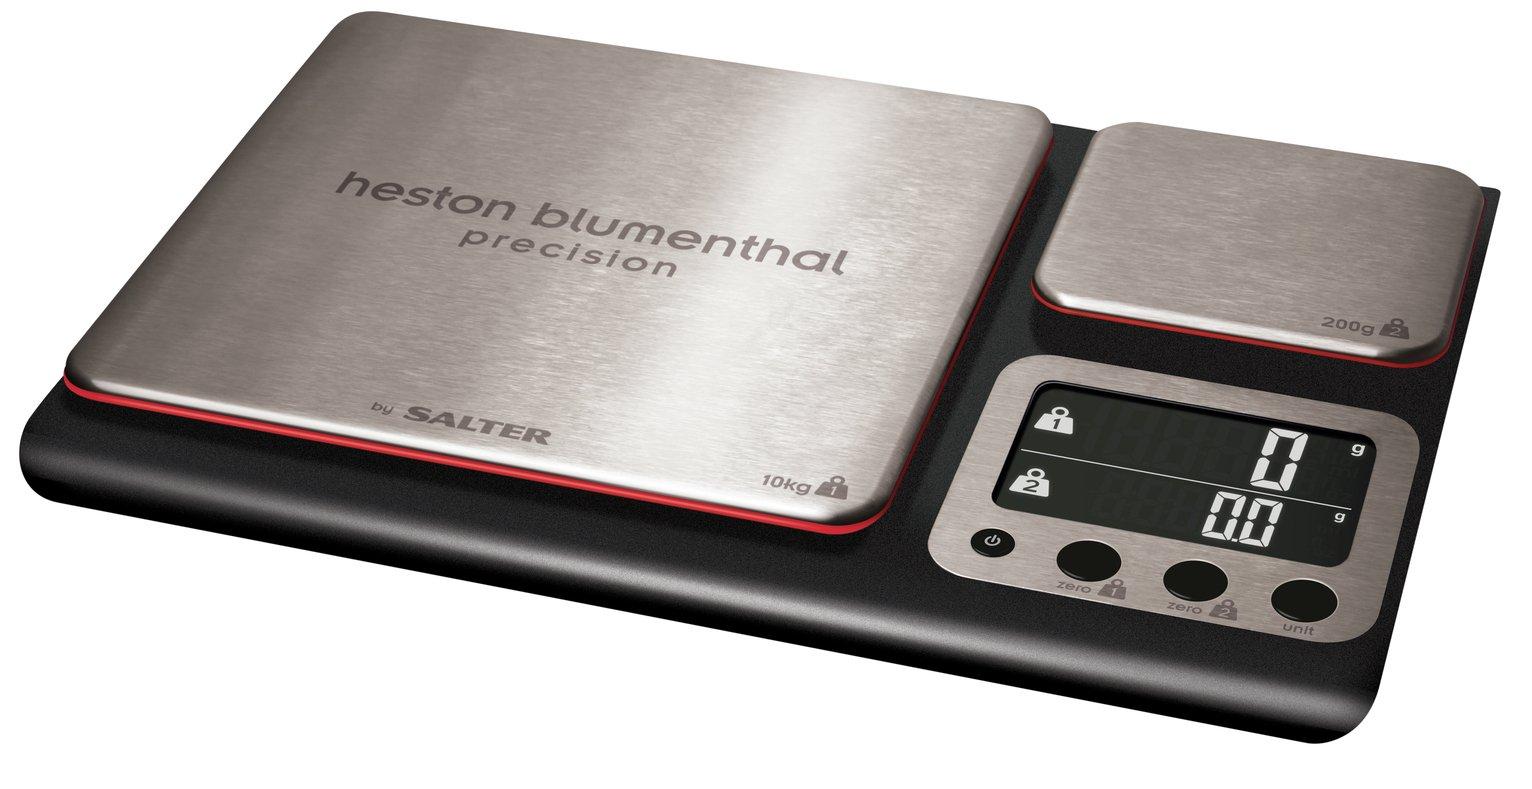 Heston Blumenthal Double Platform Digital Scale